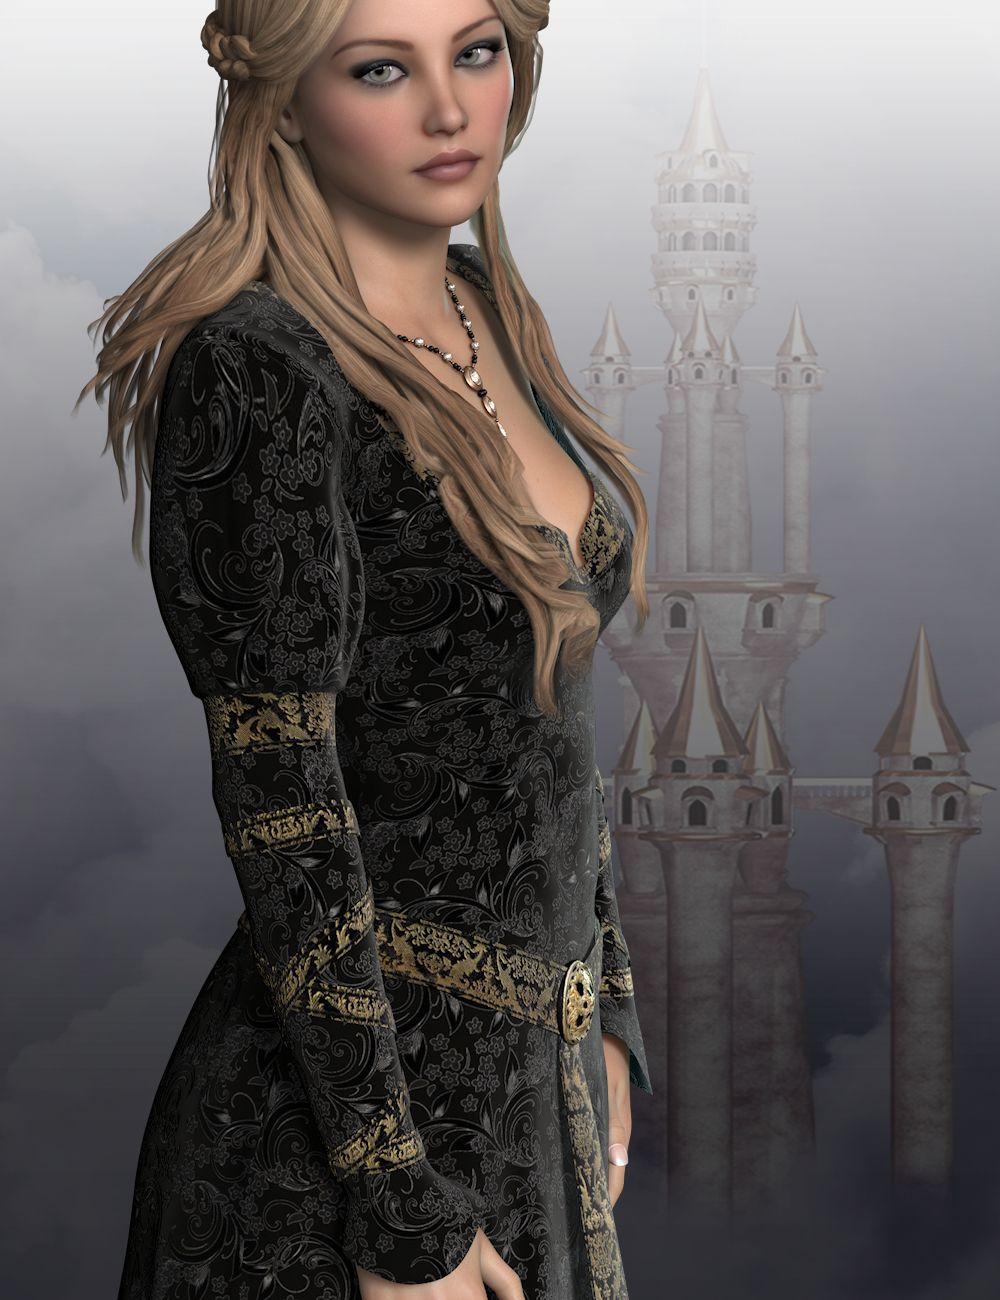 Roanmara for Genesis 2 Female(s) by: WildDesigns, 3D Models by Daz 3D